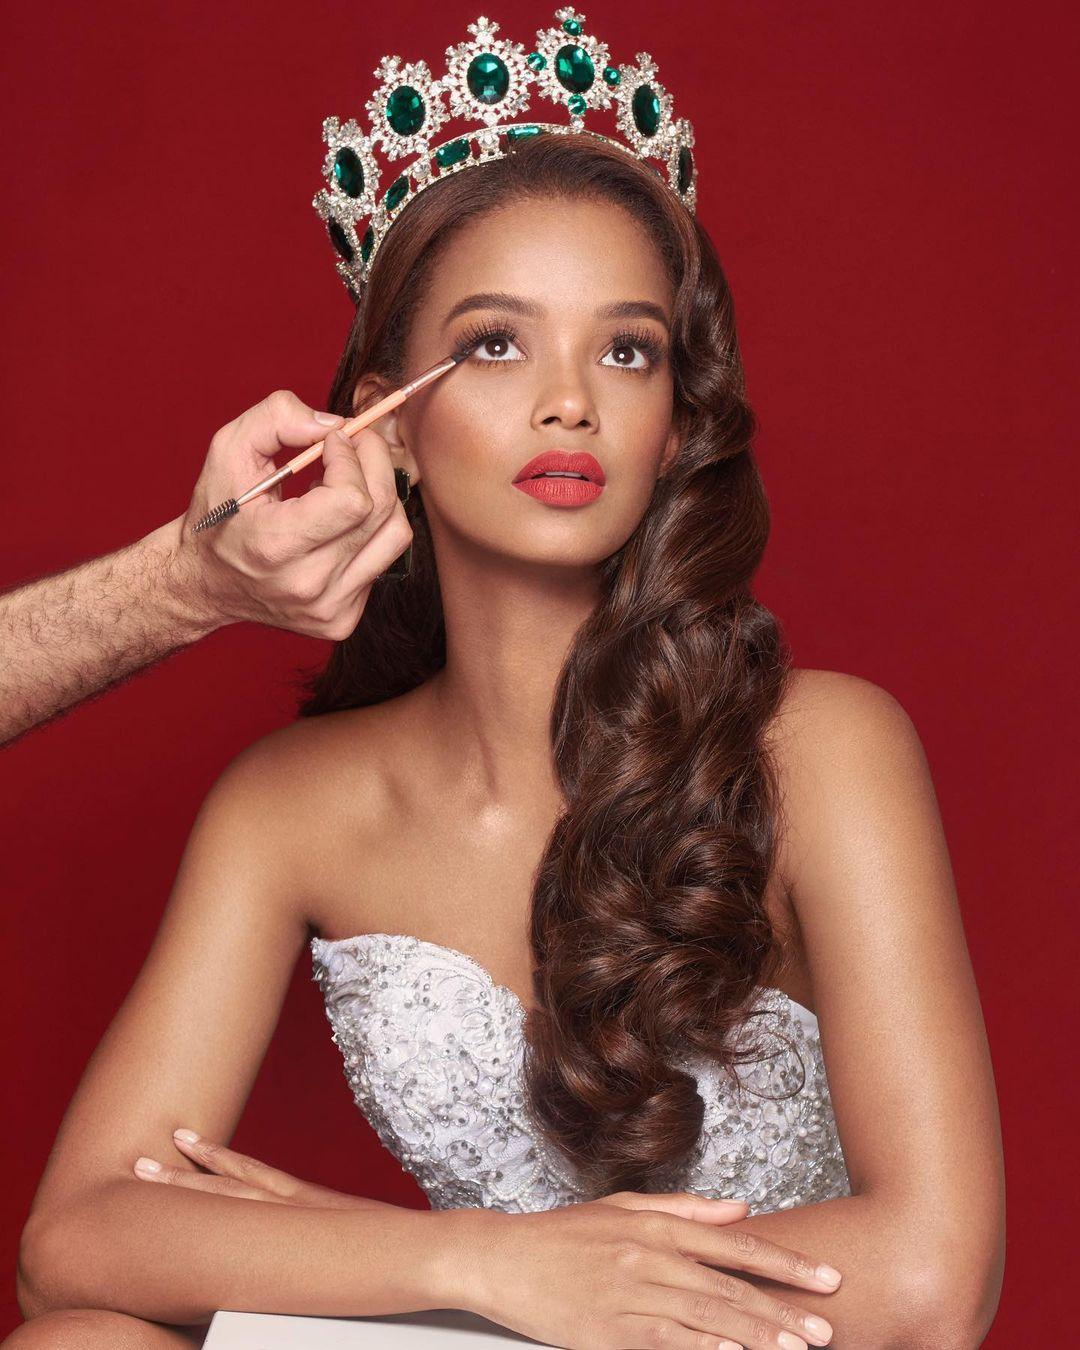 carolina londono, top 16 de miss colombia universo 2020. Carolo15